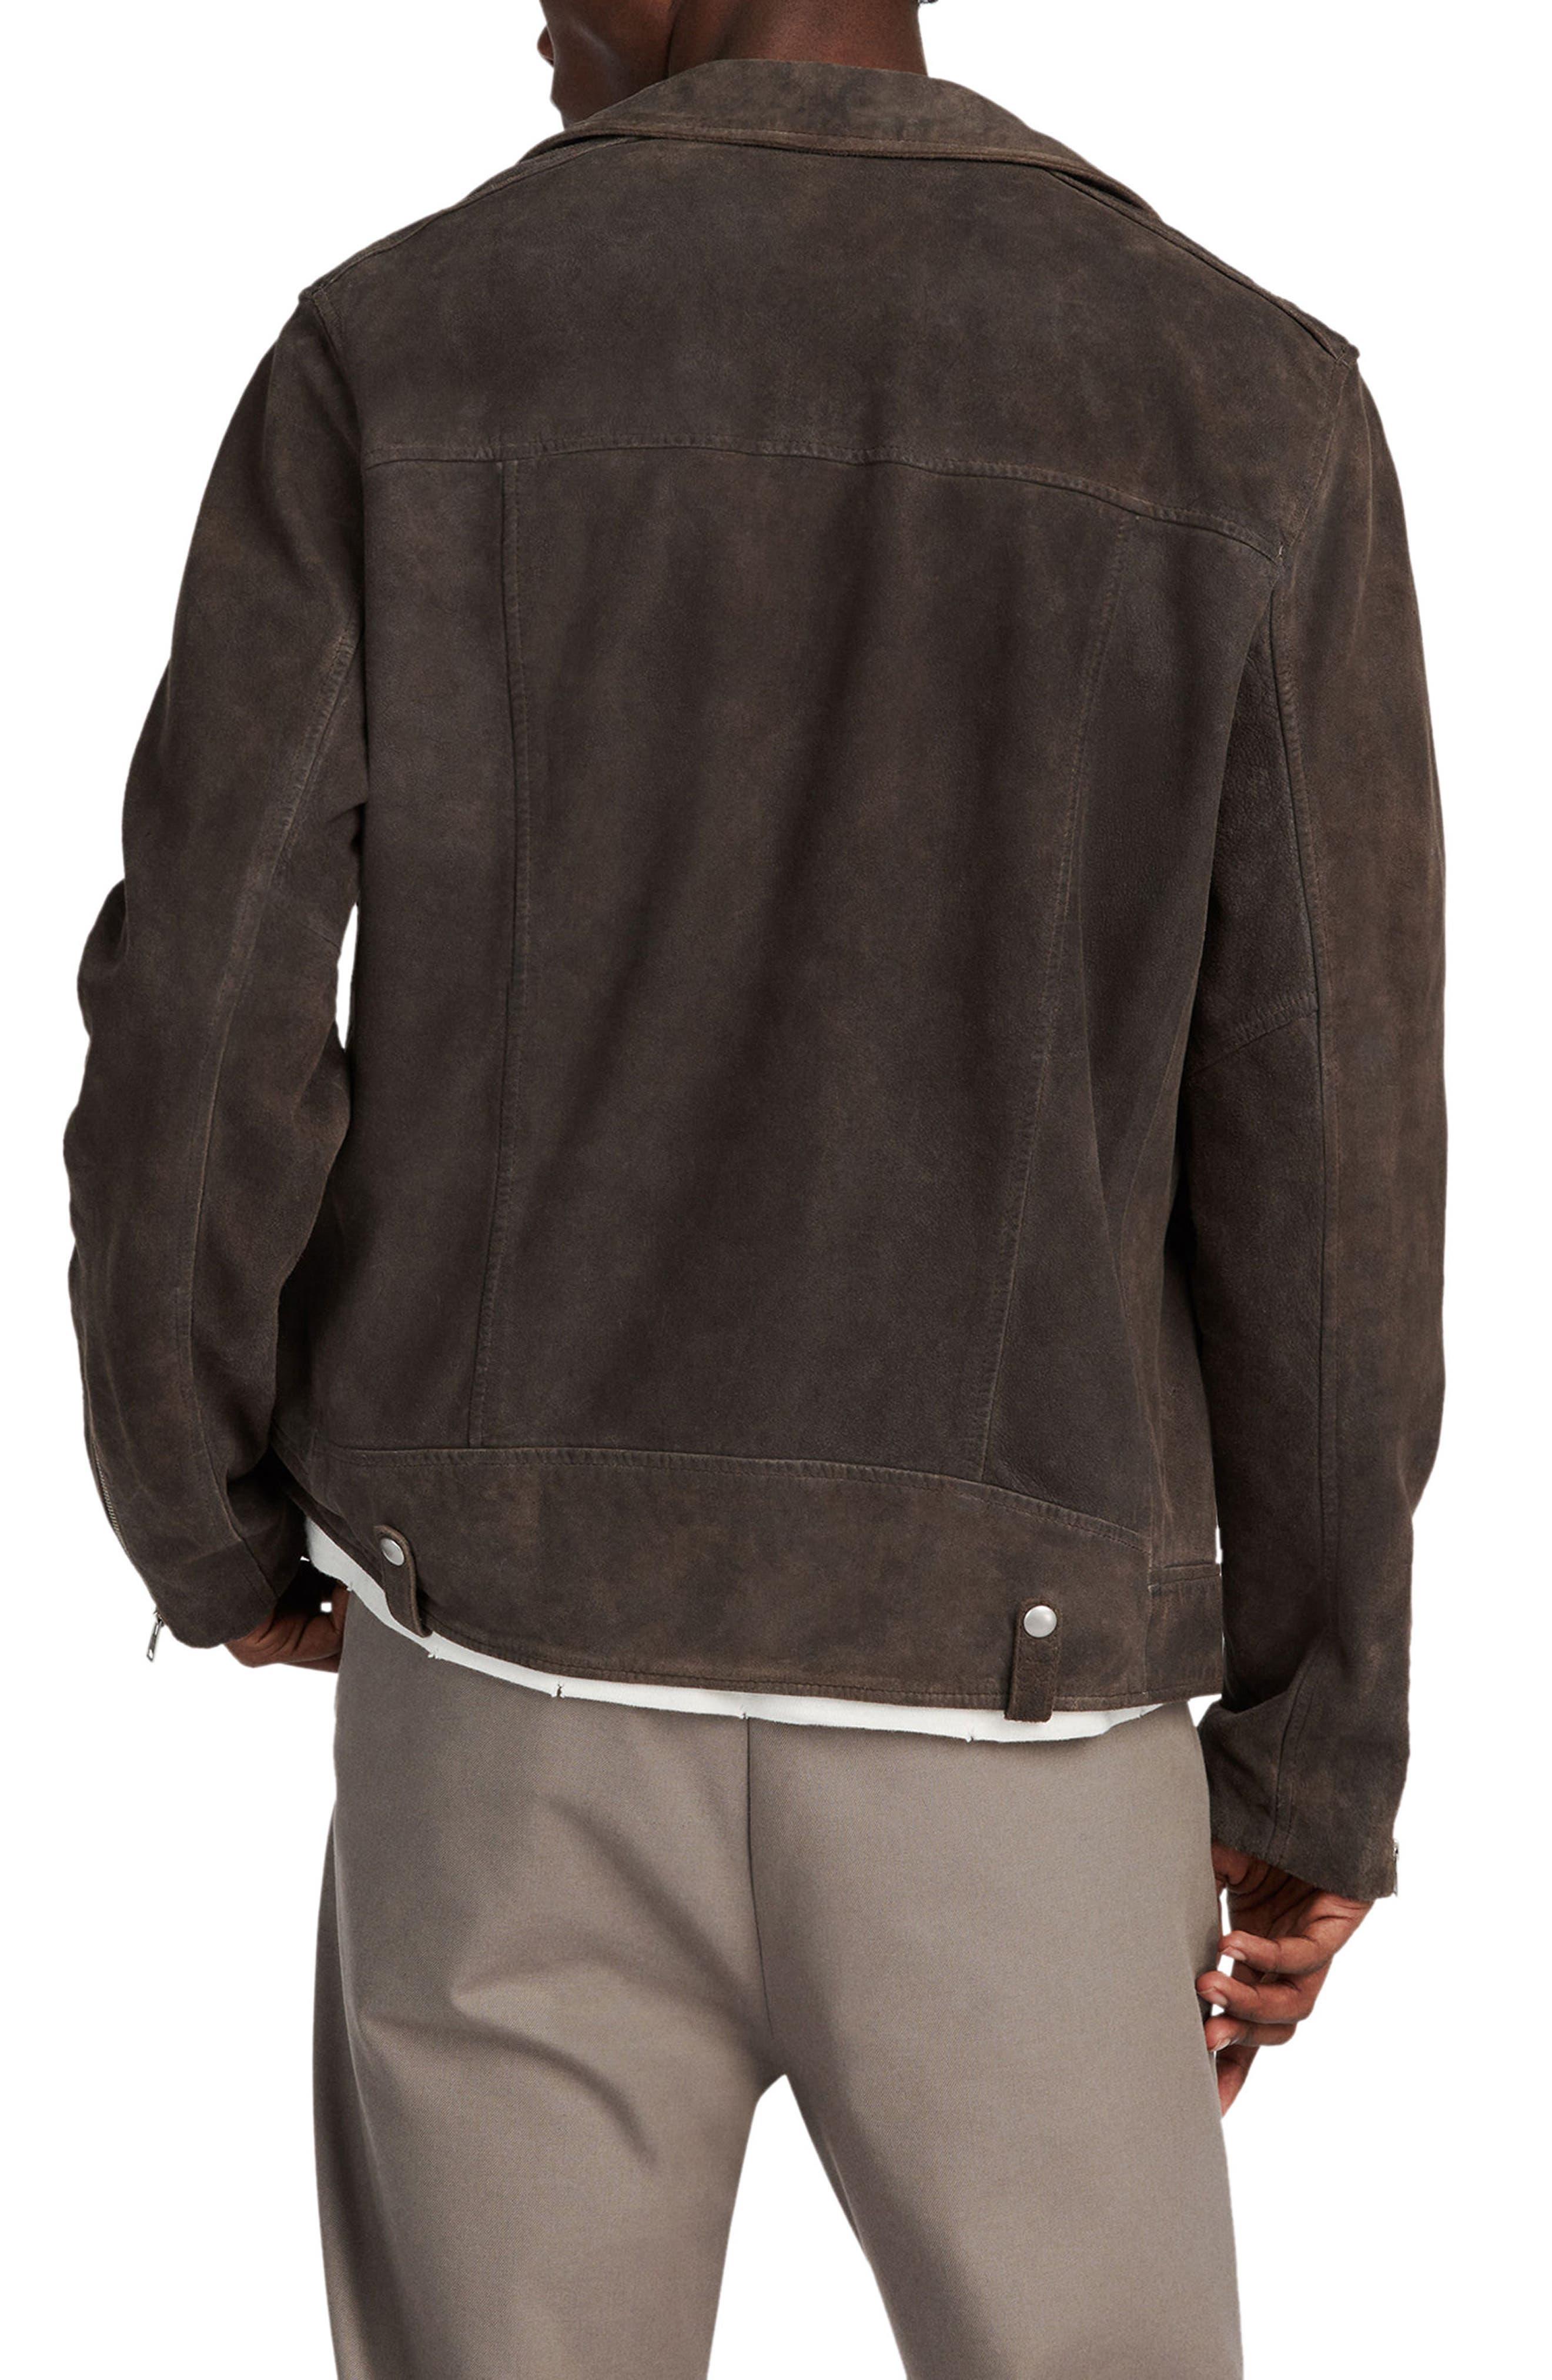 Kano Suede Moto Jacket,                             Alternate thumbnail 2, color,                             GRAVEL